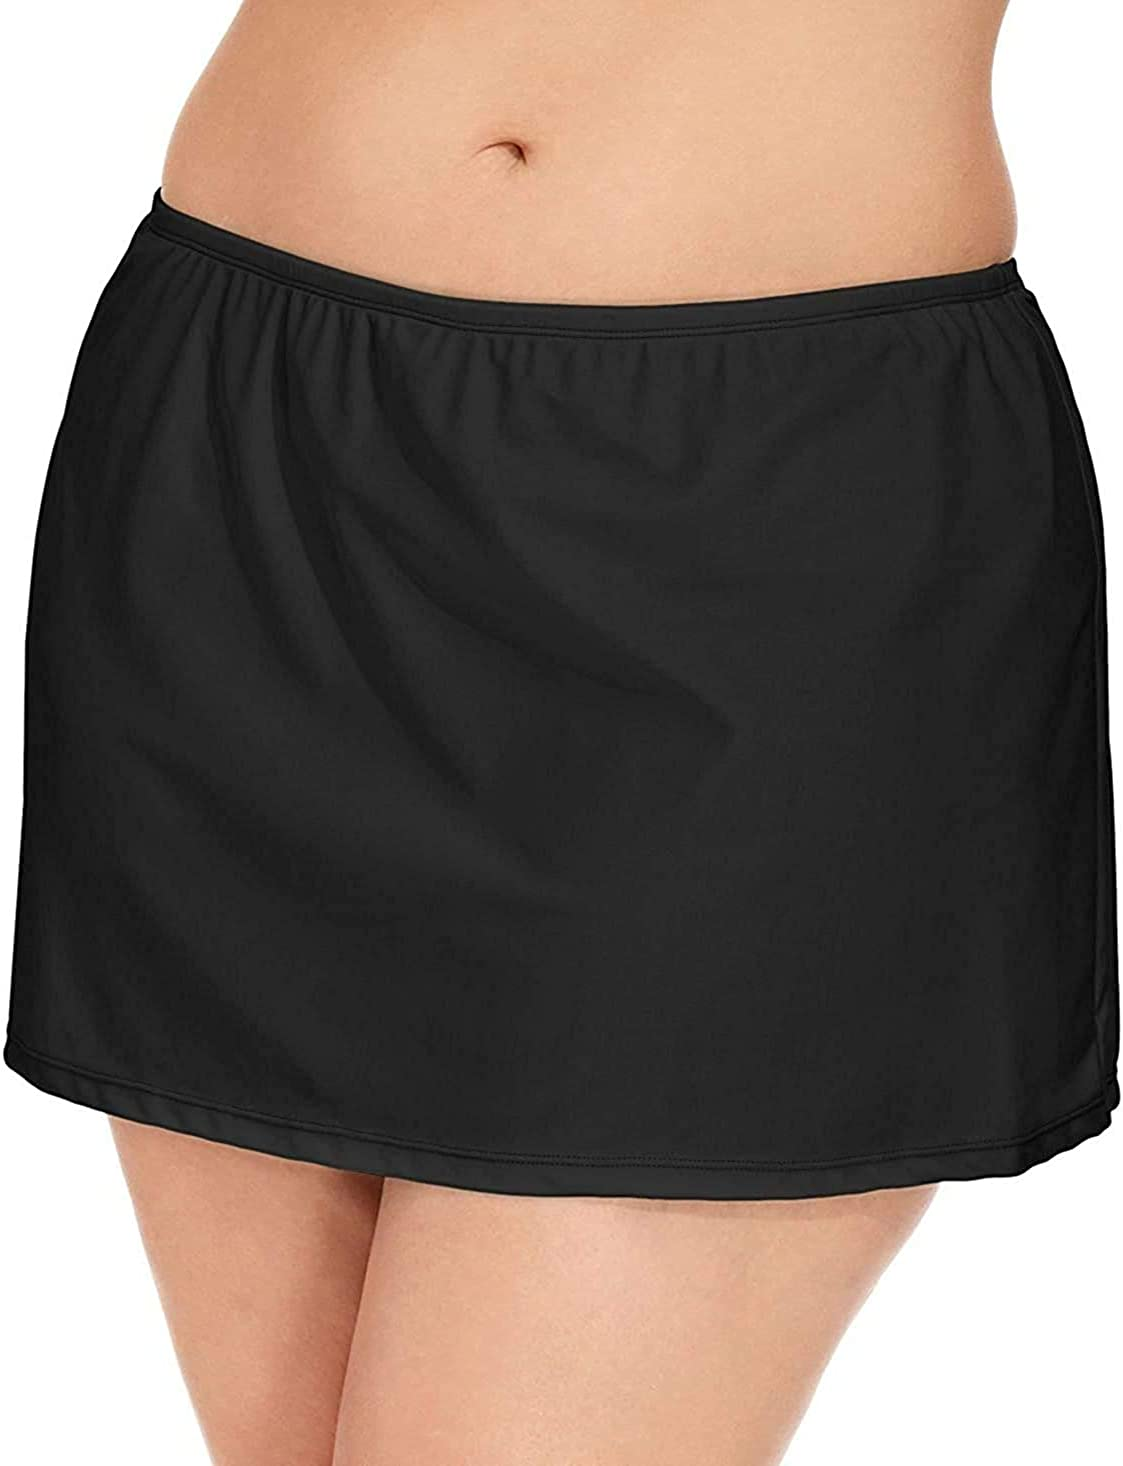 Island Escape Women's Plus Size Skirt Swim Bottom Separates